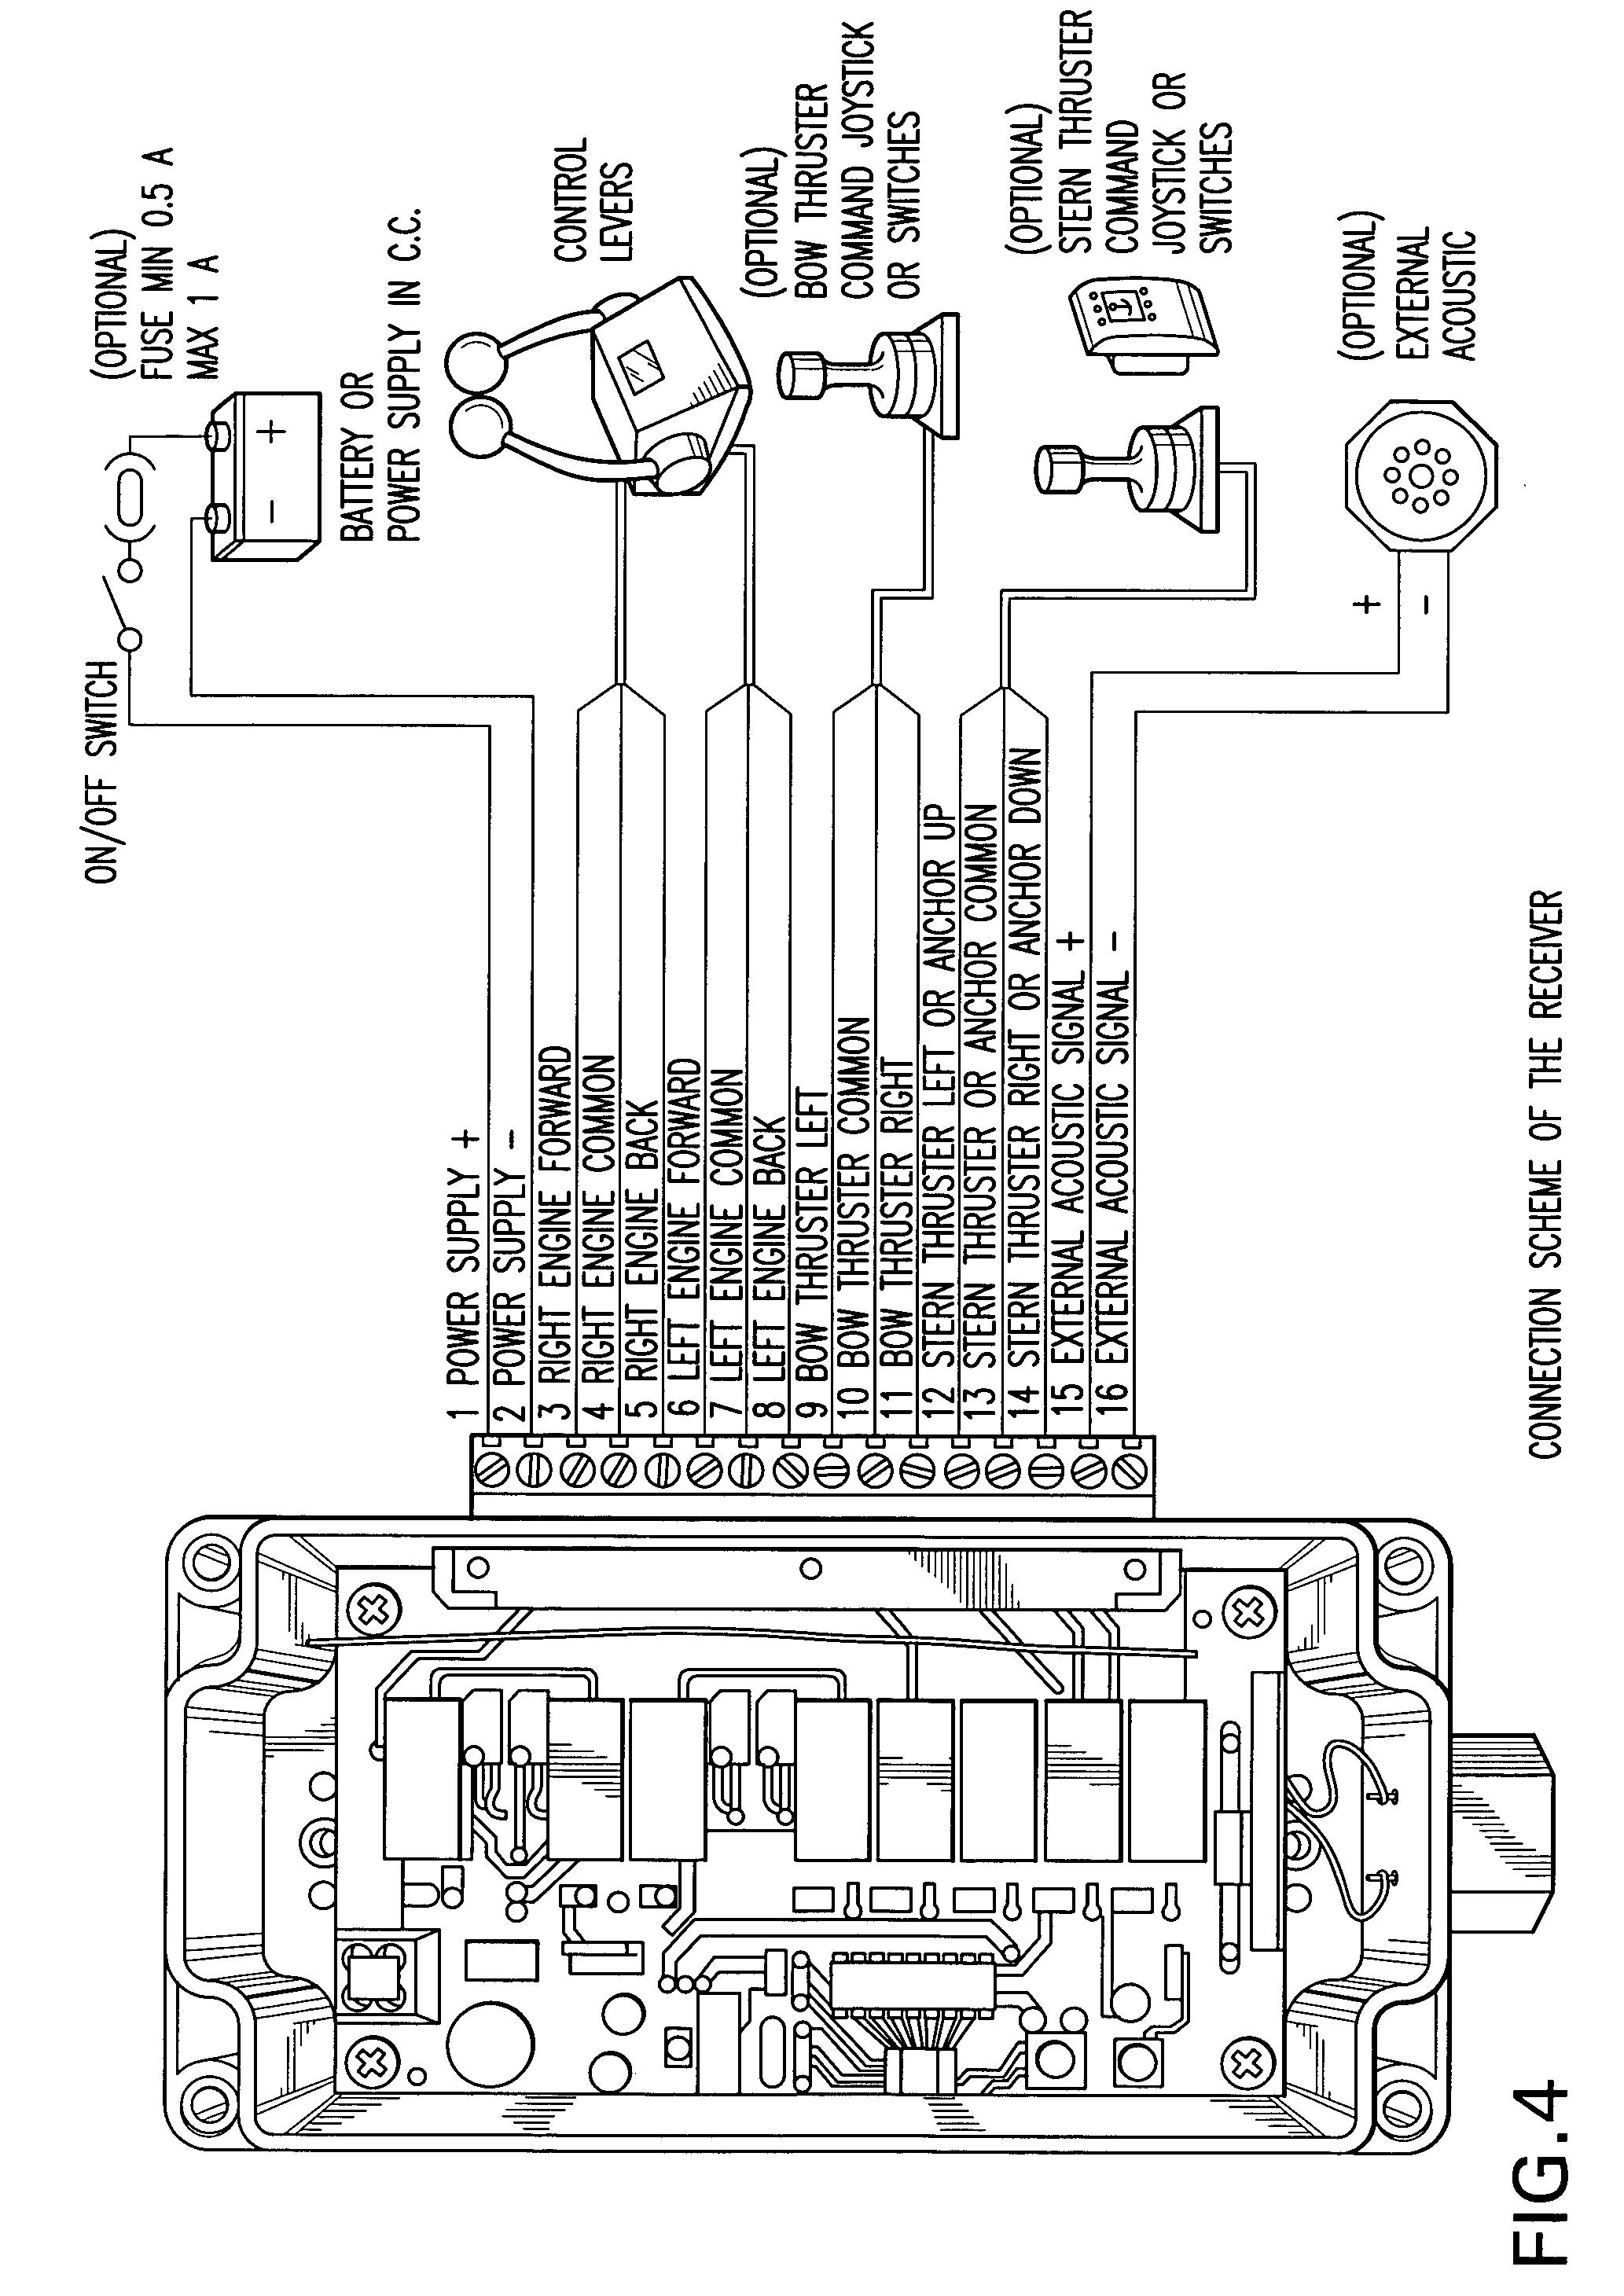 Magnificent 24 Volt Wiring Diagram For Trolling Motor Festooning ...